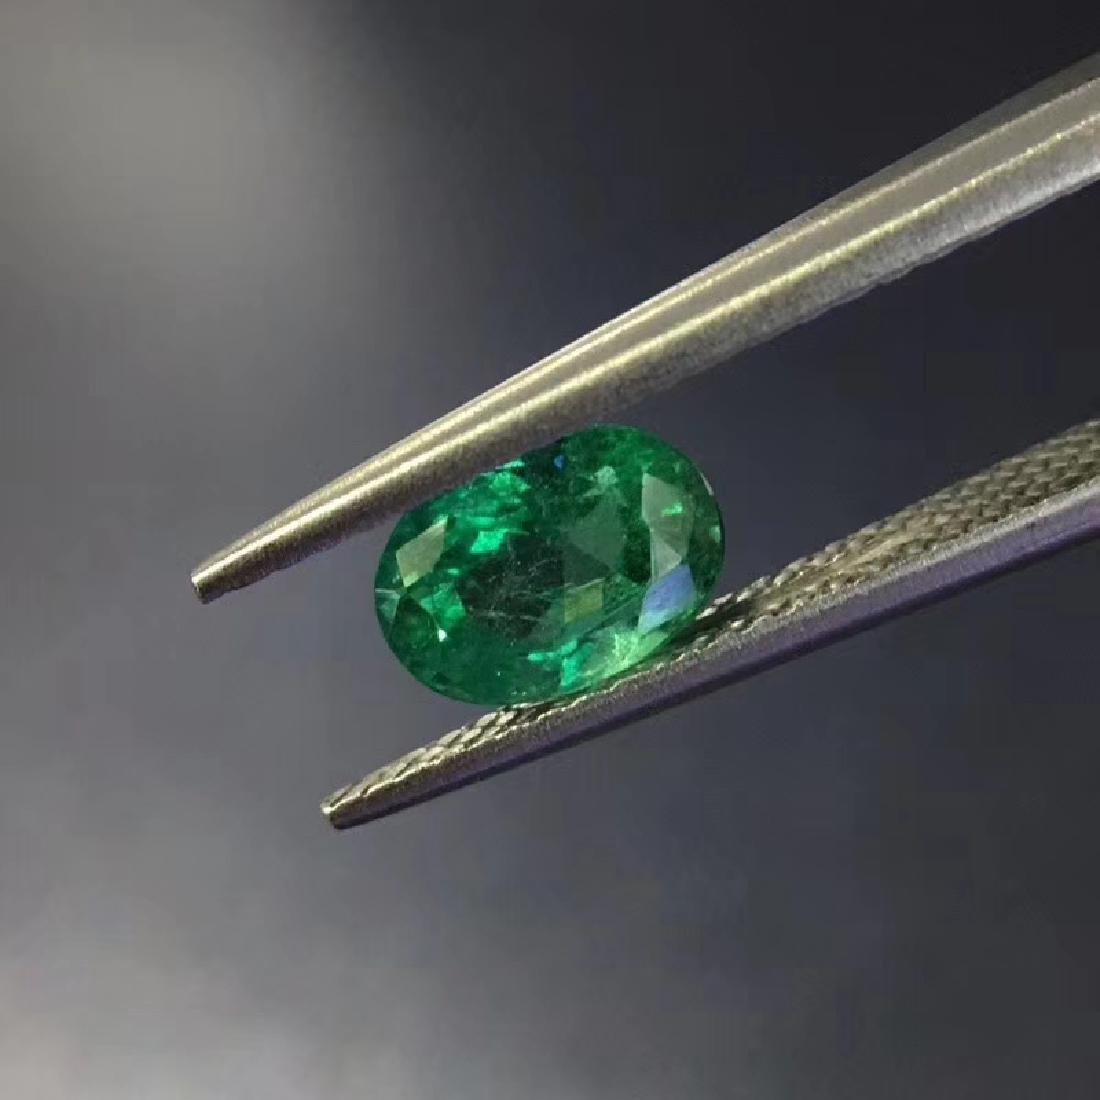 1.06 ct Emerald 5.0*6.9*4.2 mm Oval Cut - 3